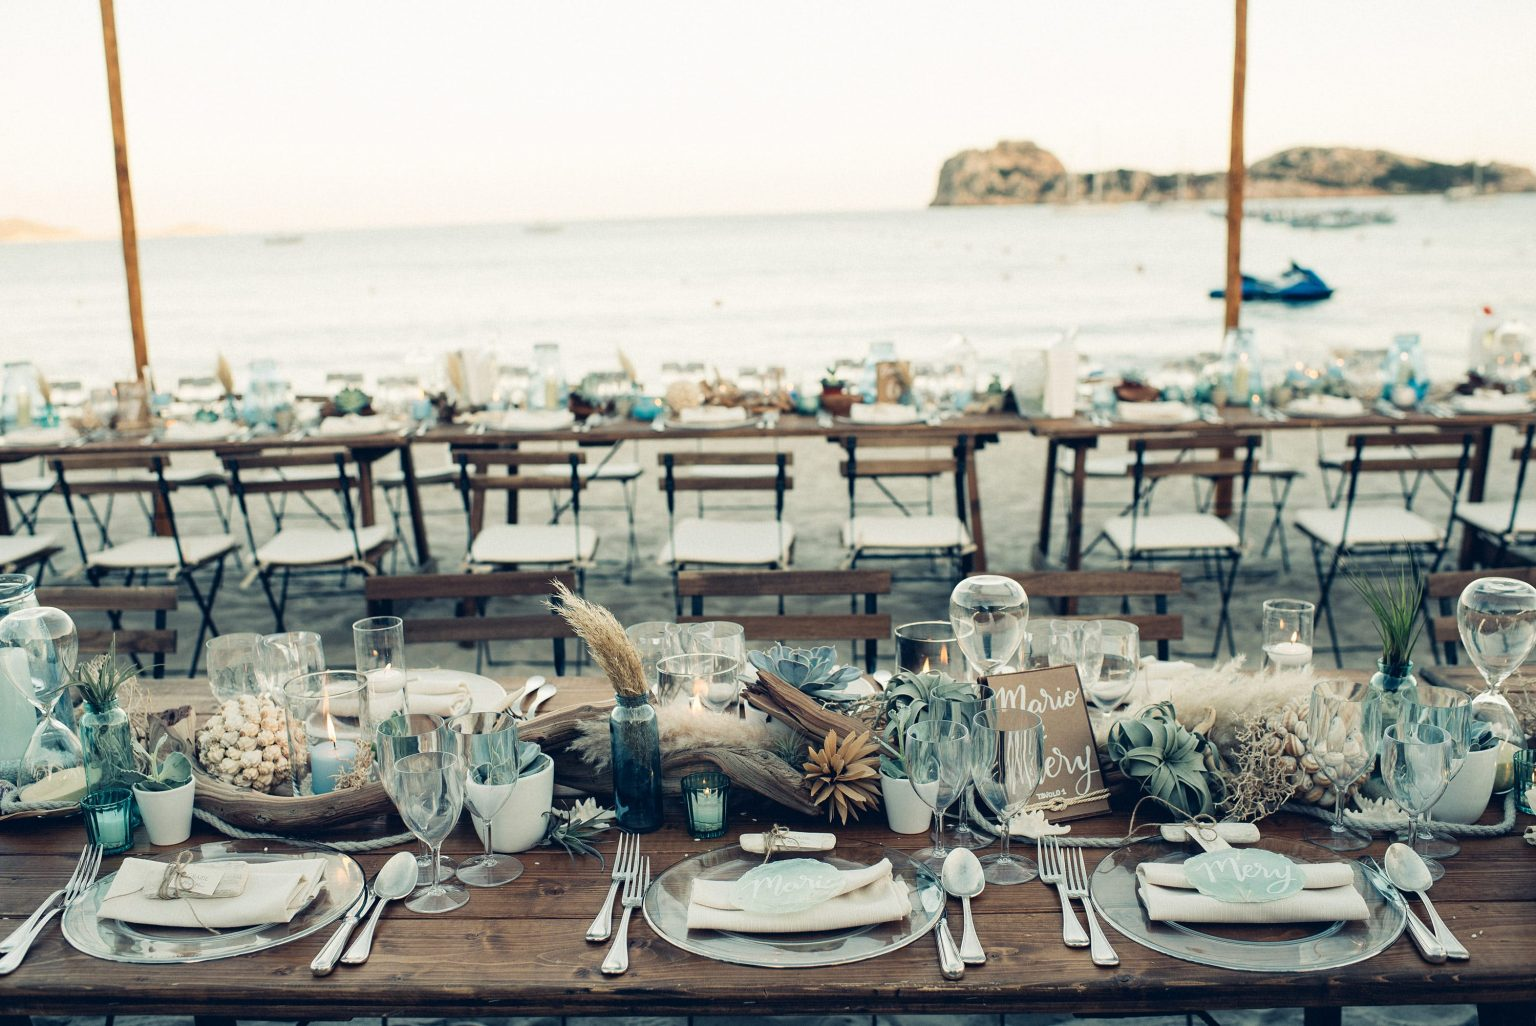 Mario and Mery, beach wedding table decor